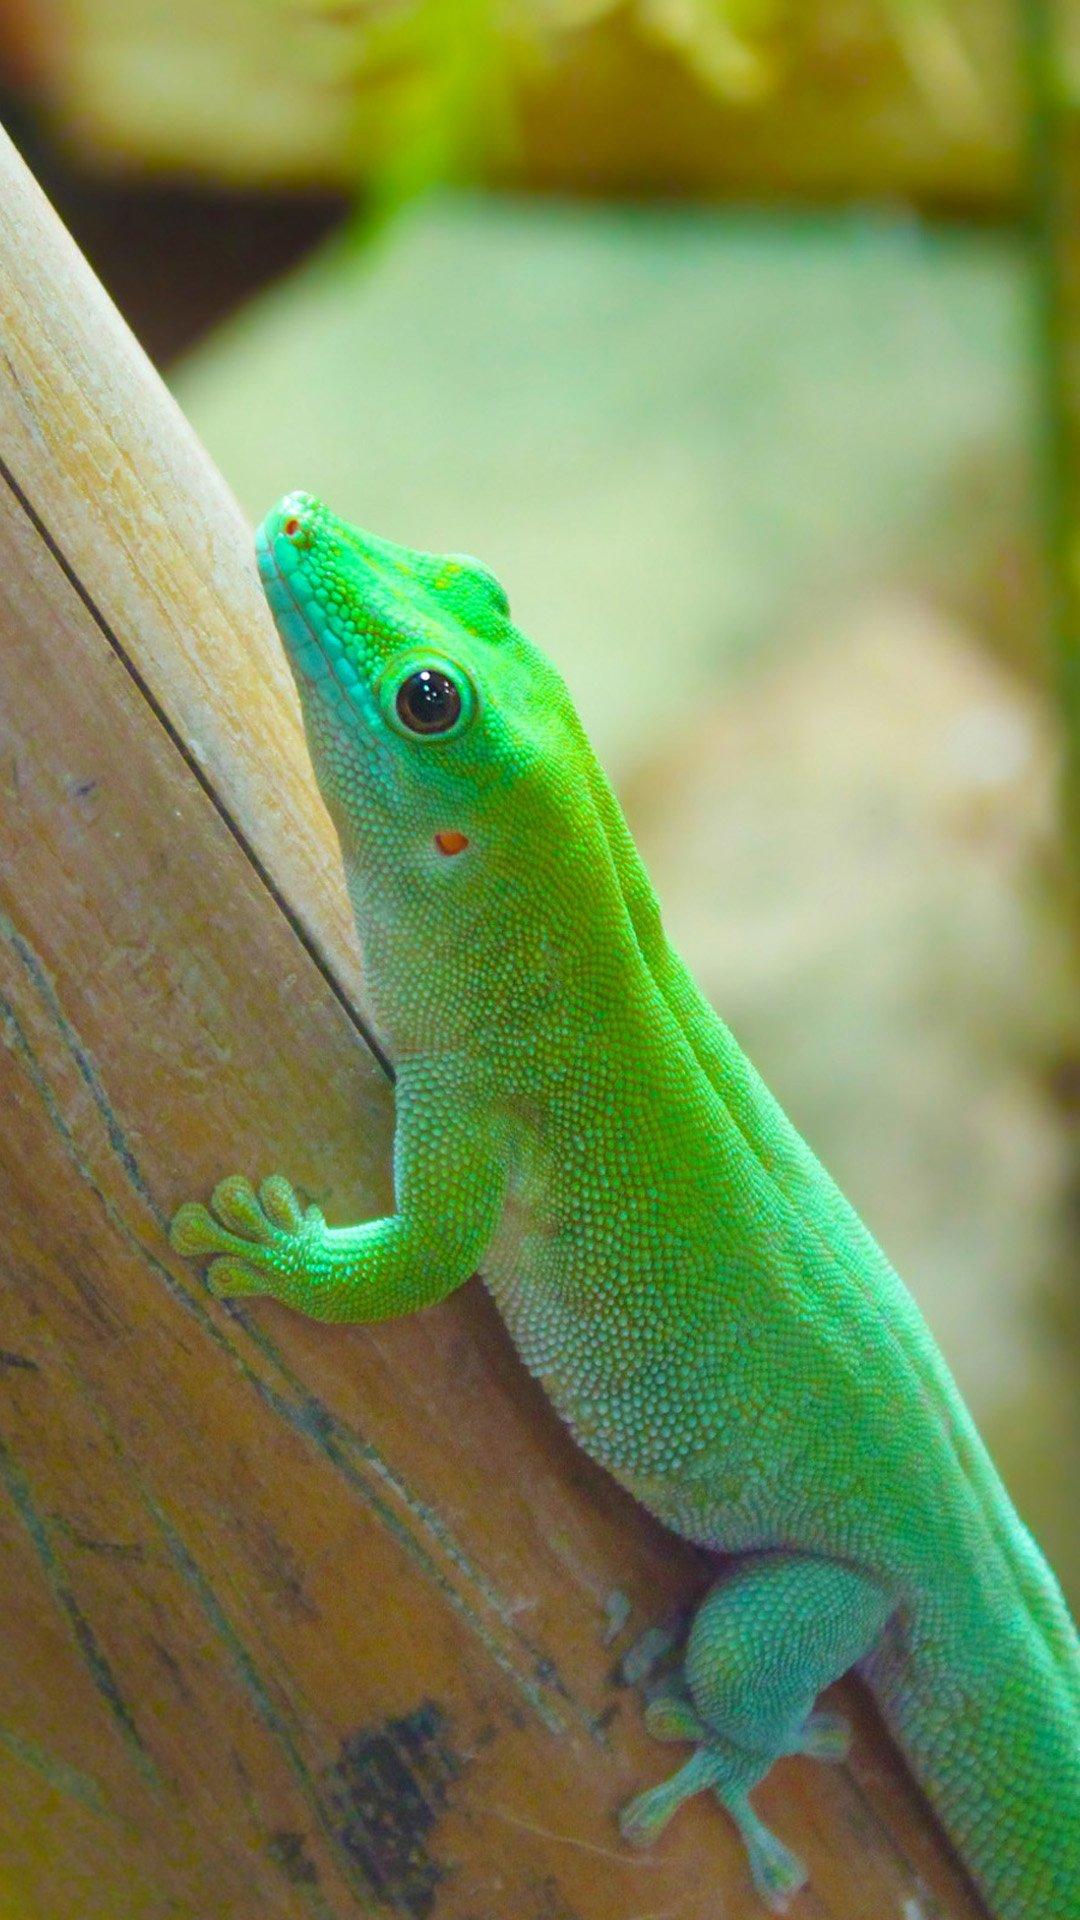 Beautiful chameleon Reptiles iphone 6 plus wallpaper iPhone 6 Plus 1080x1920